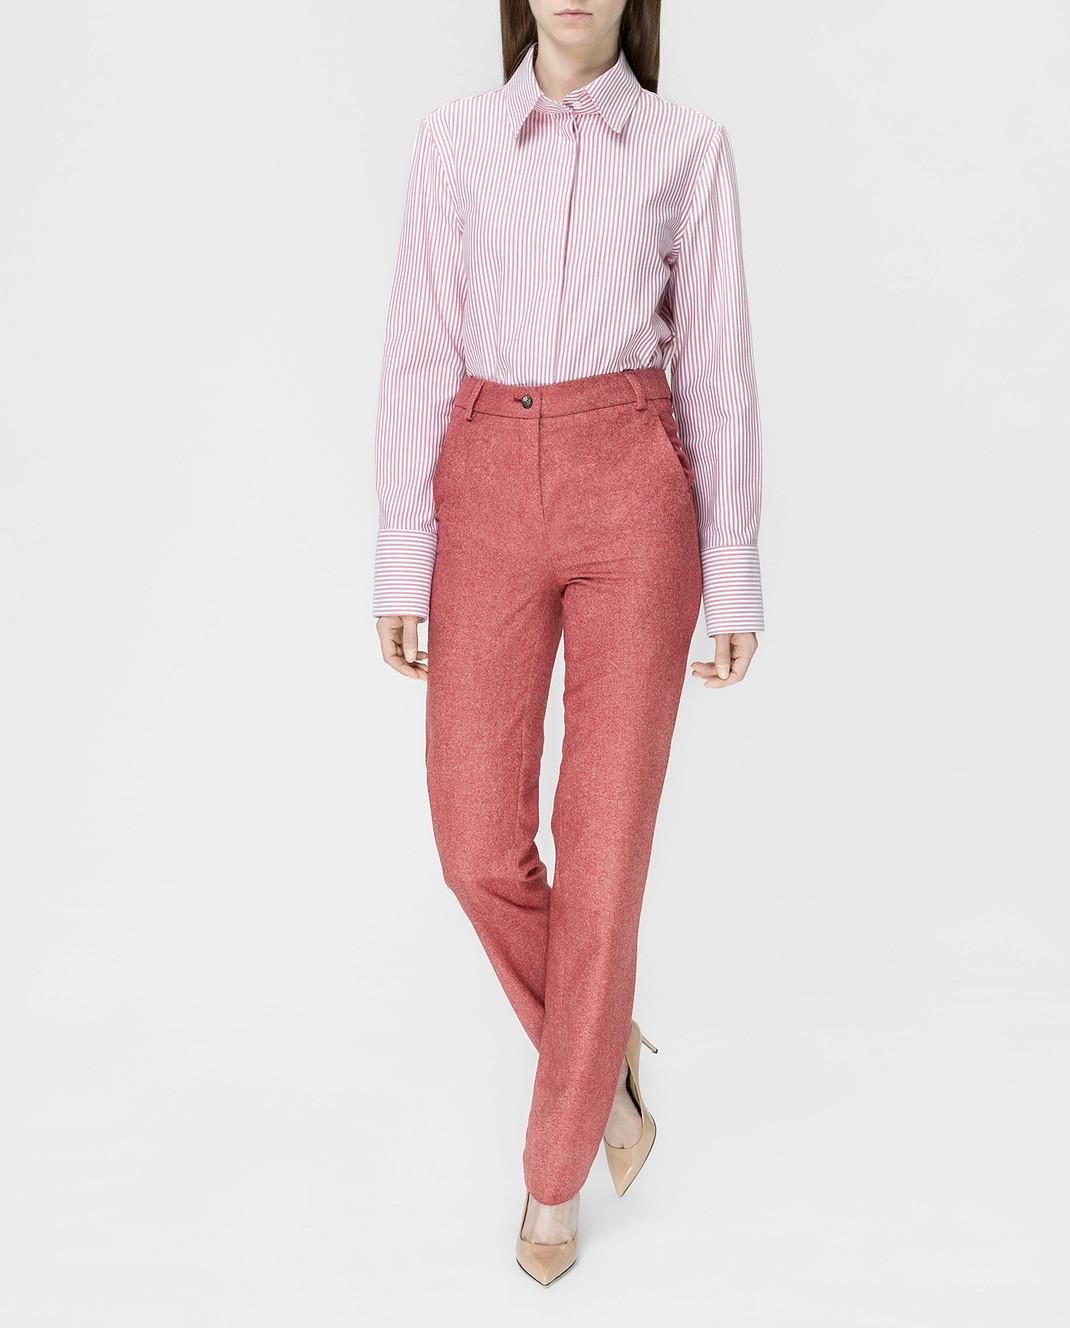 Stile Latino Бордовые брюки PDMARIELLA2EWU01 изображение 2